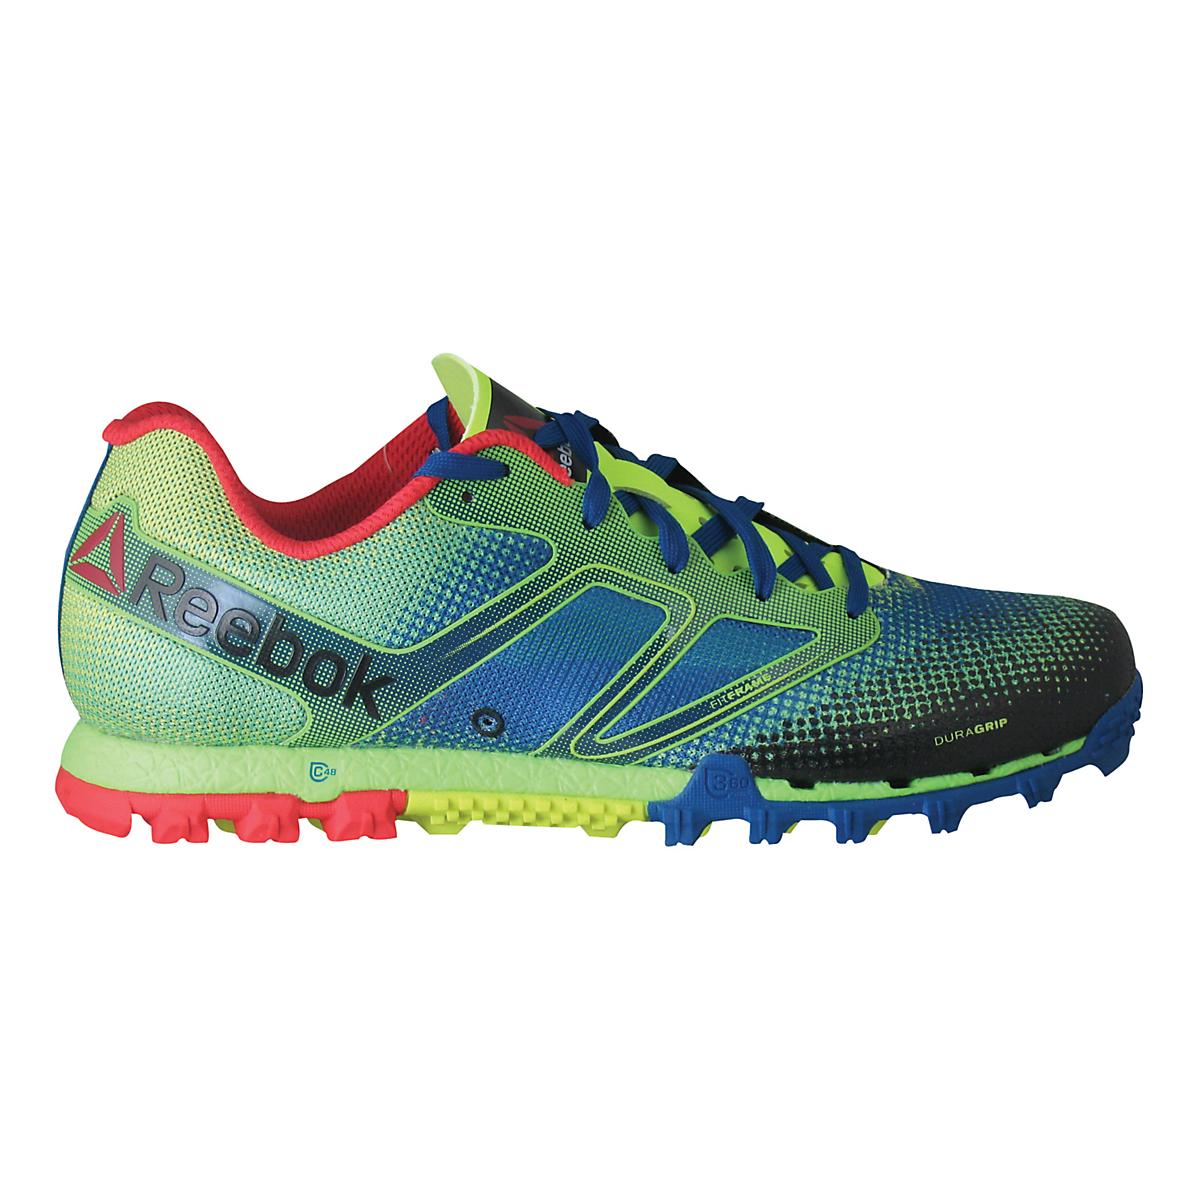 e83b3b1b8 Mens Reebok All Terrain Super Running Shoe at Road Runner Sports